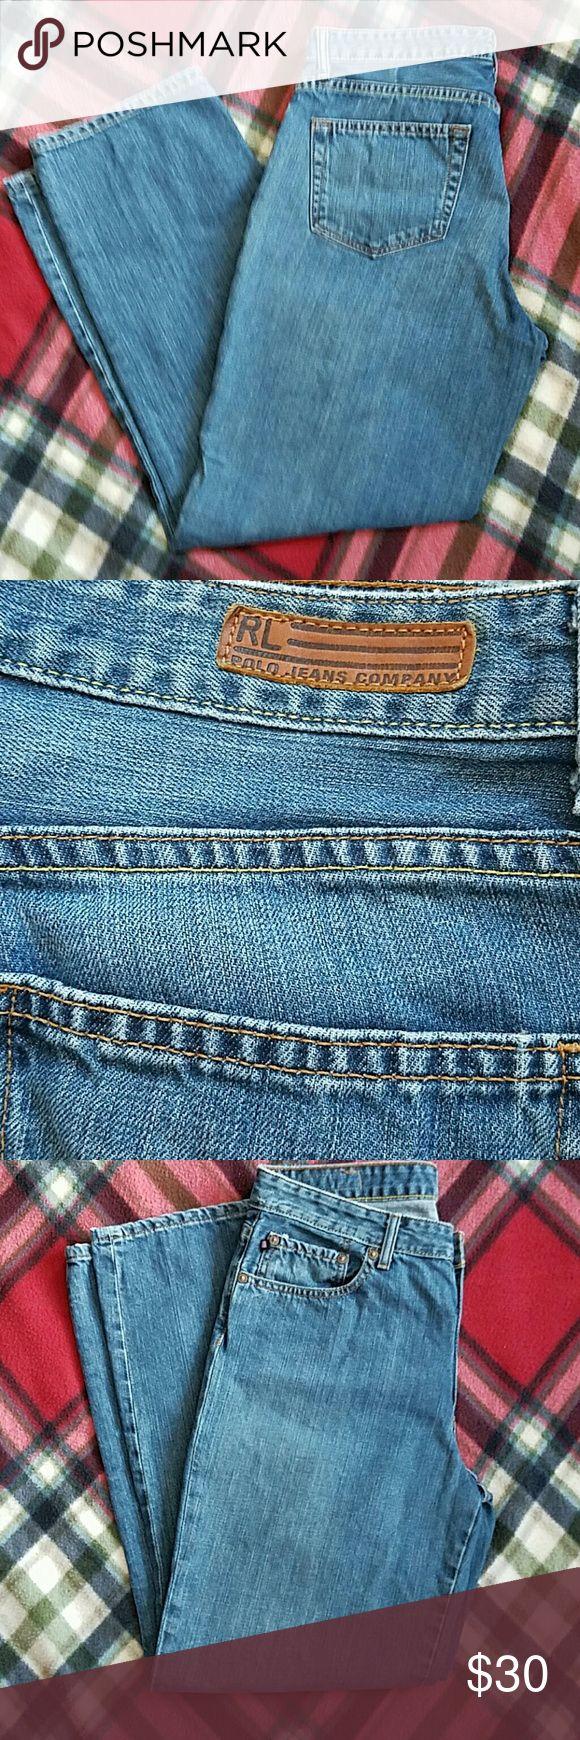 RL POLO JEANS COMPANY JEANS GREAT SHAPE... RL POLO JEANS COMPANY Jeans Boot Cut